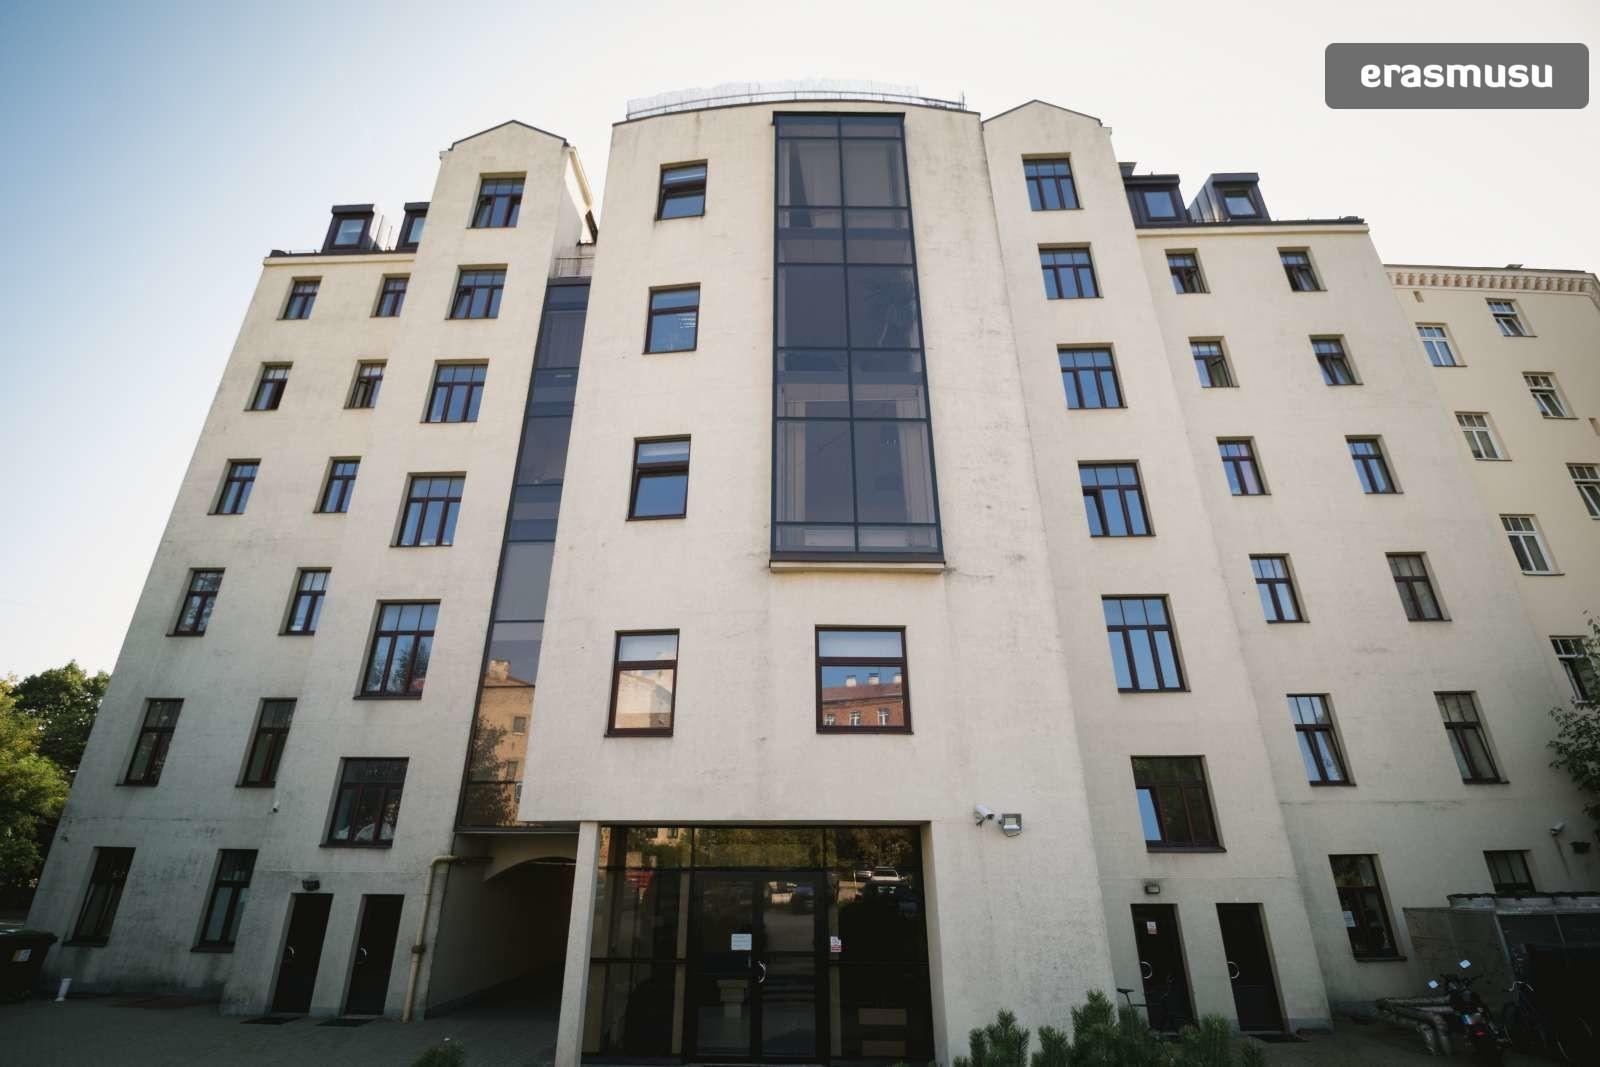 Firsa Sadovnikova iela, Latgales priekšpilseta, Riga, LV-1003, Latvia